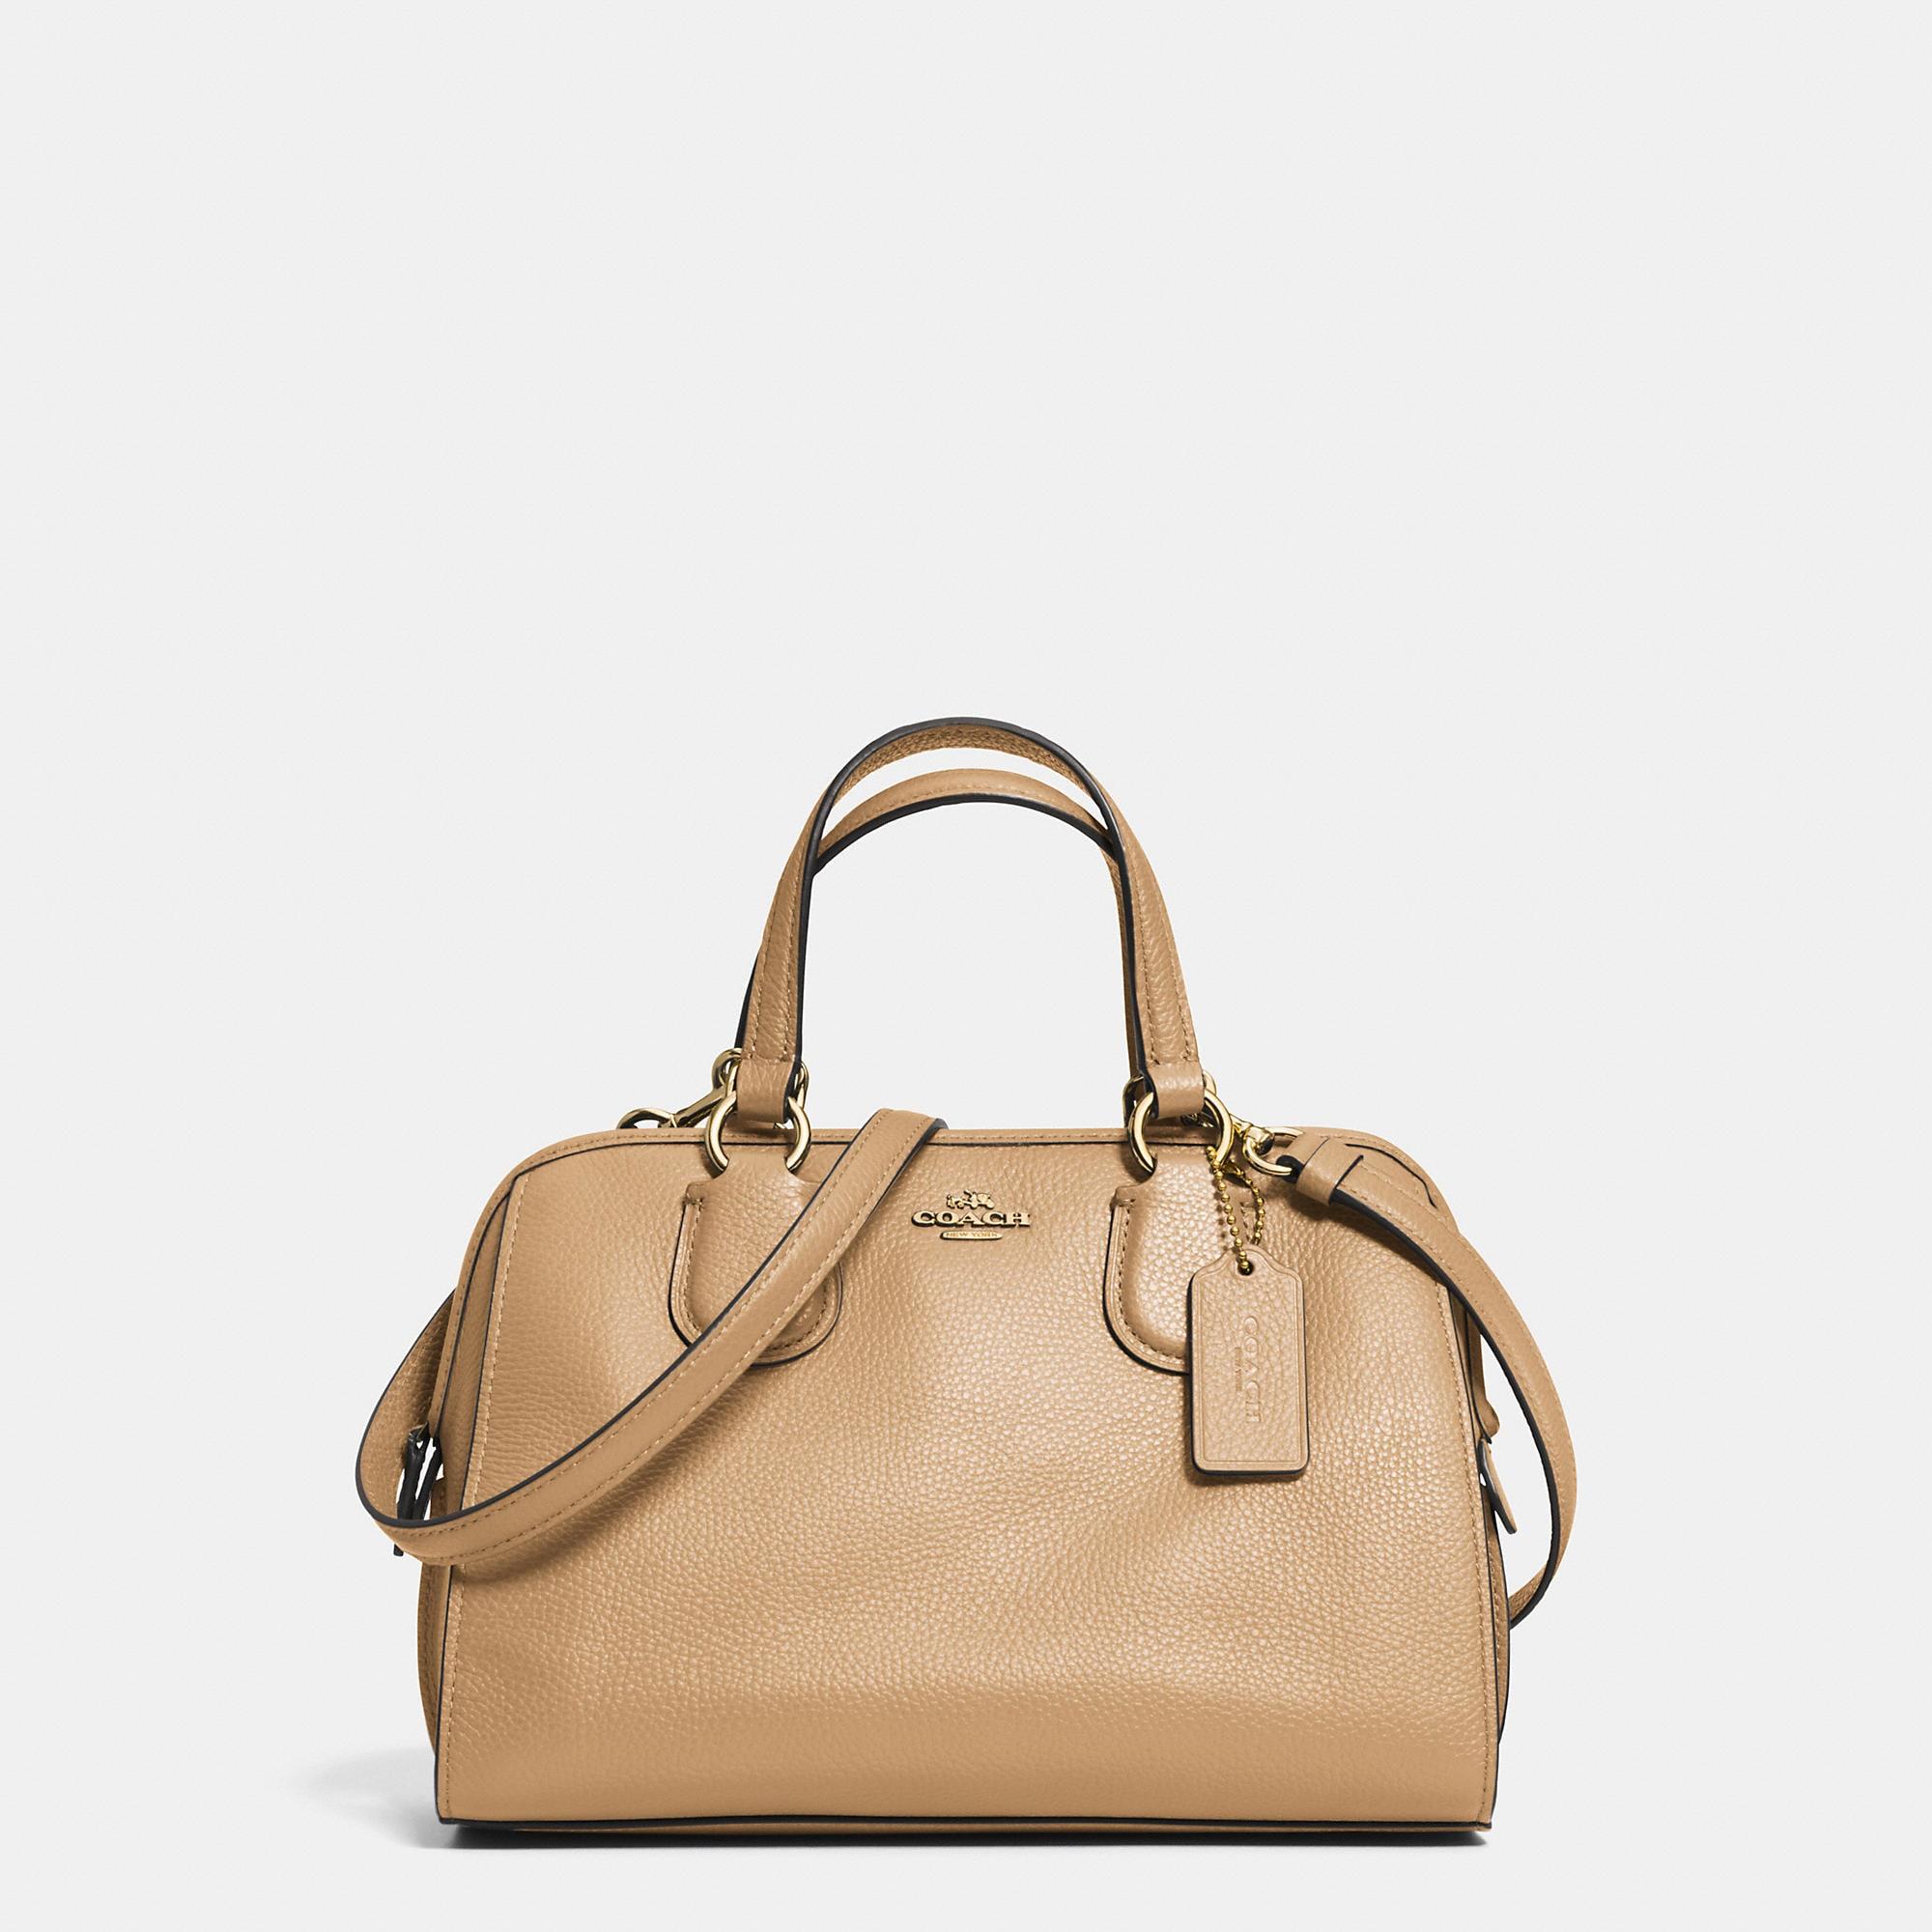 Coach Mini Nolita Satchel In Leather